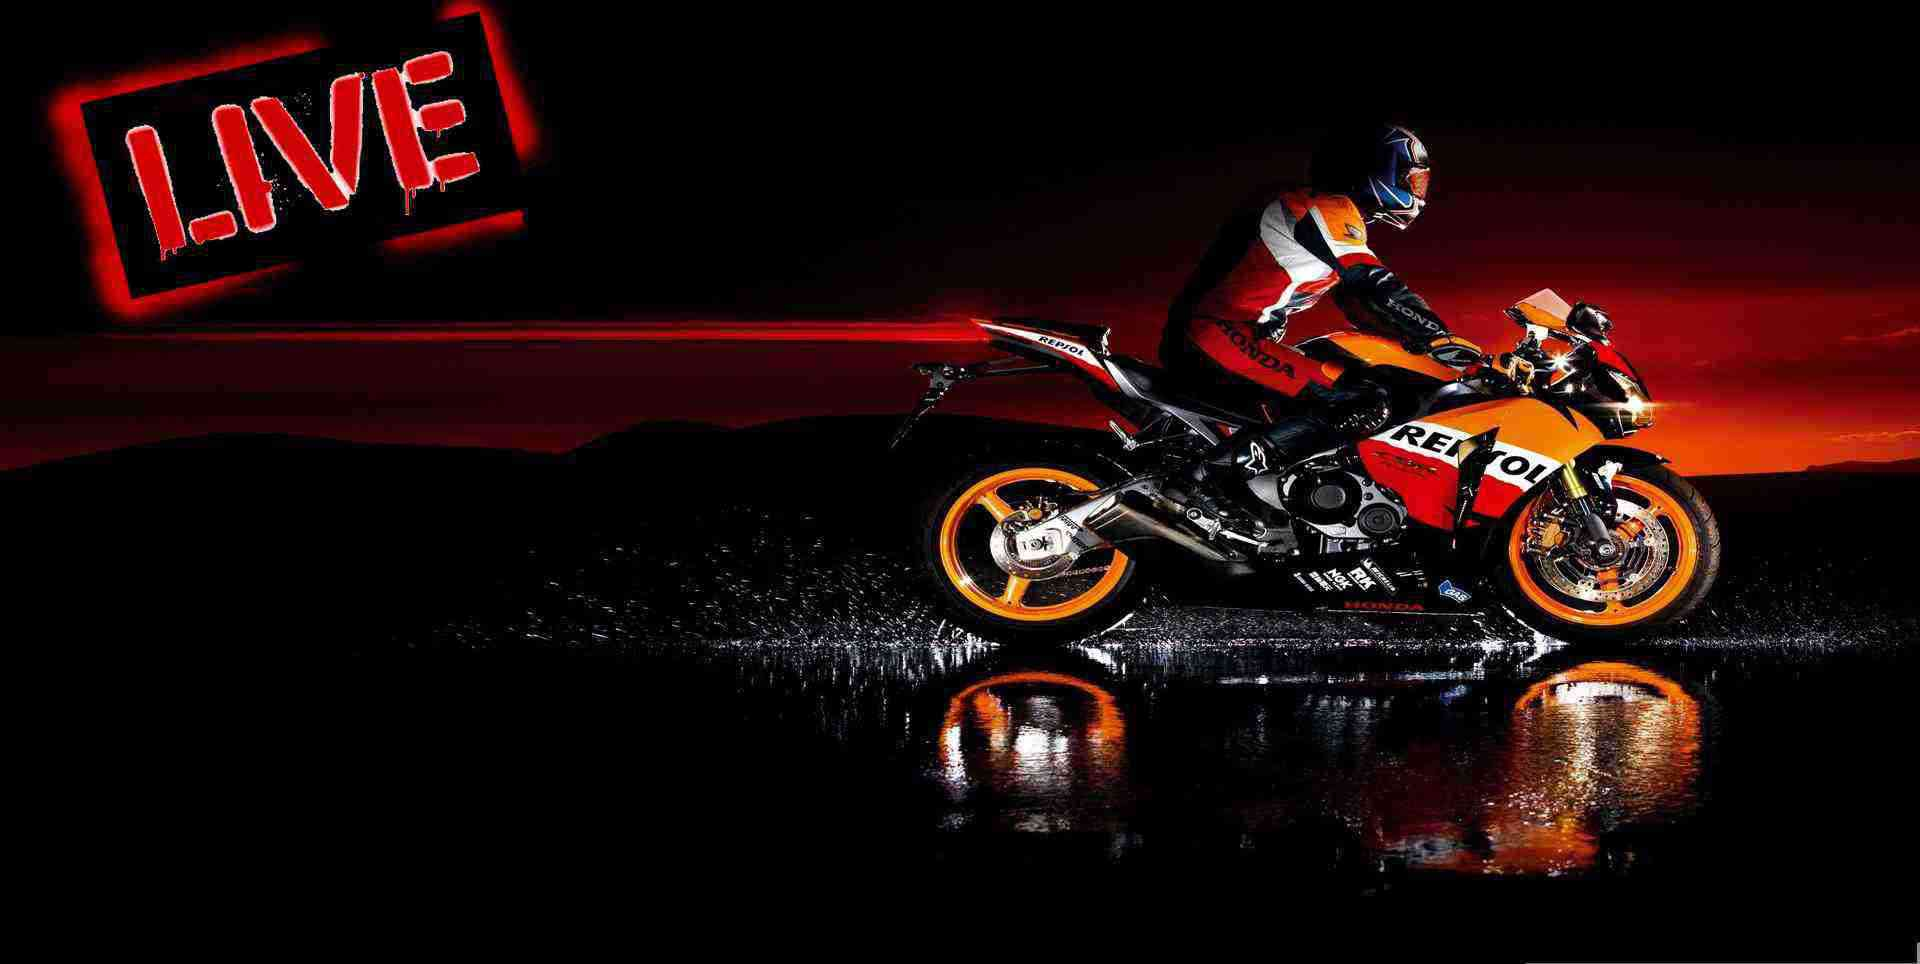 Live Magny Cours Round 11 Superbike FIM World Championship 2014 Online